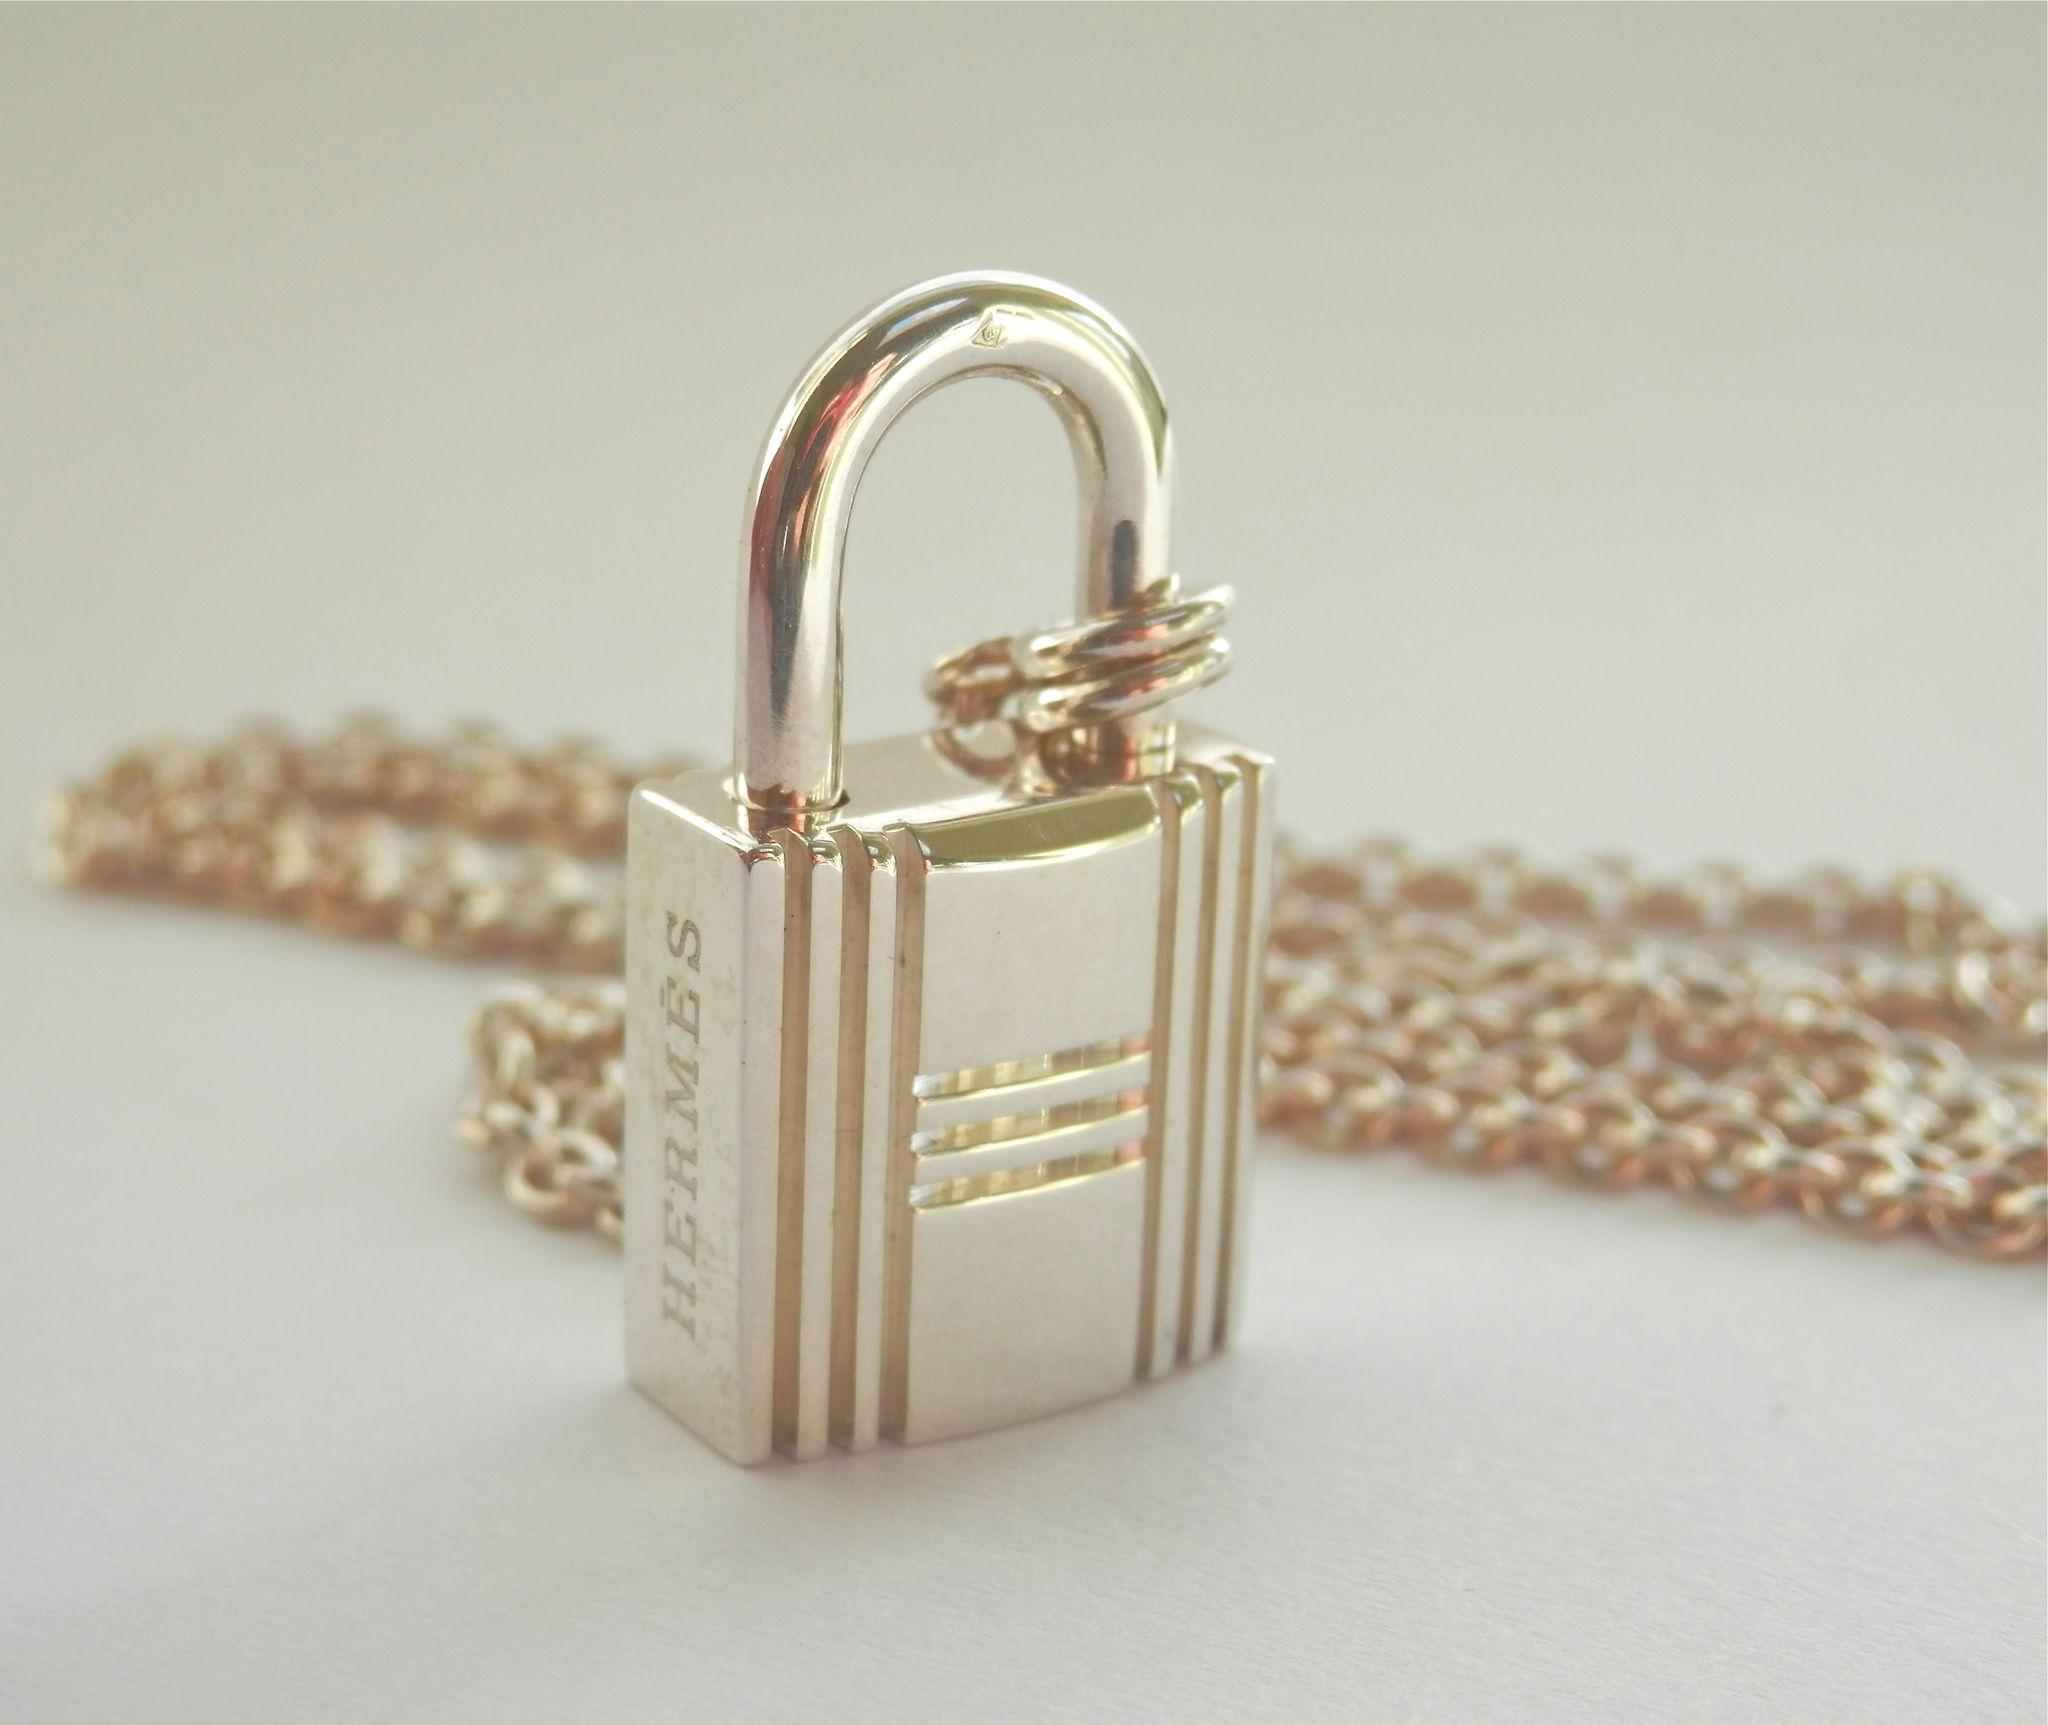 Terrific Authentic Hermes Silver Lock Pendant w/Chain